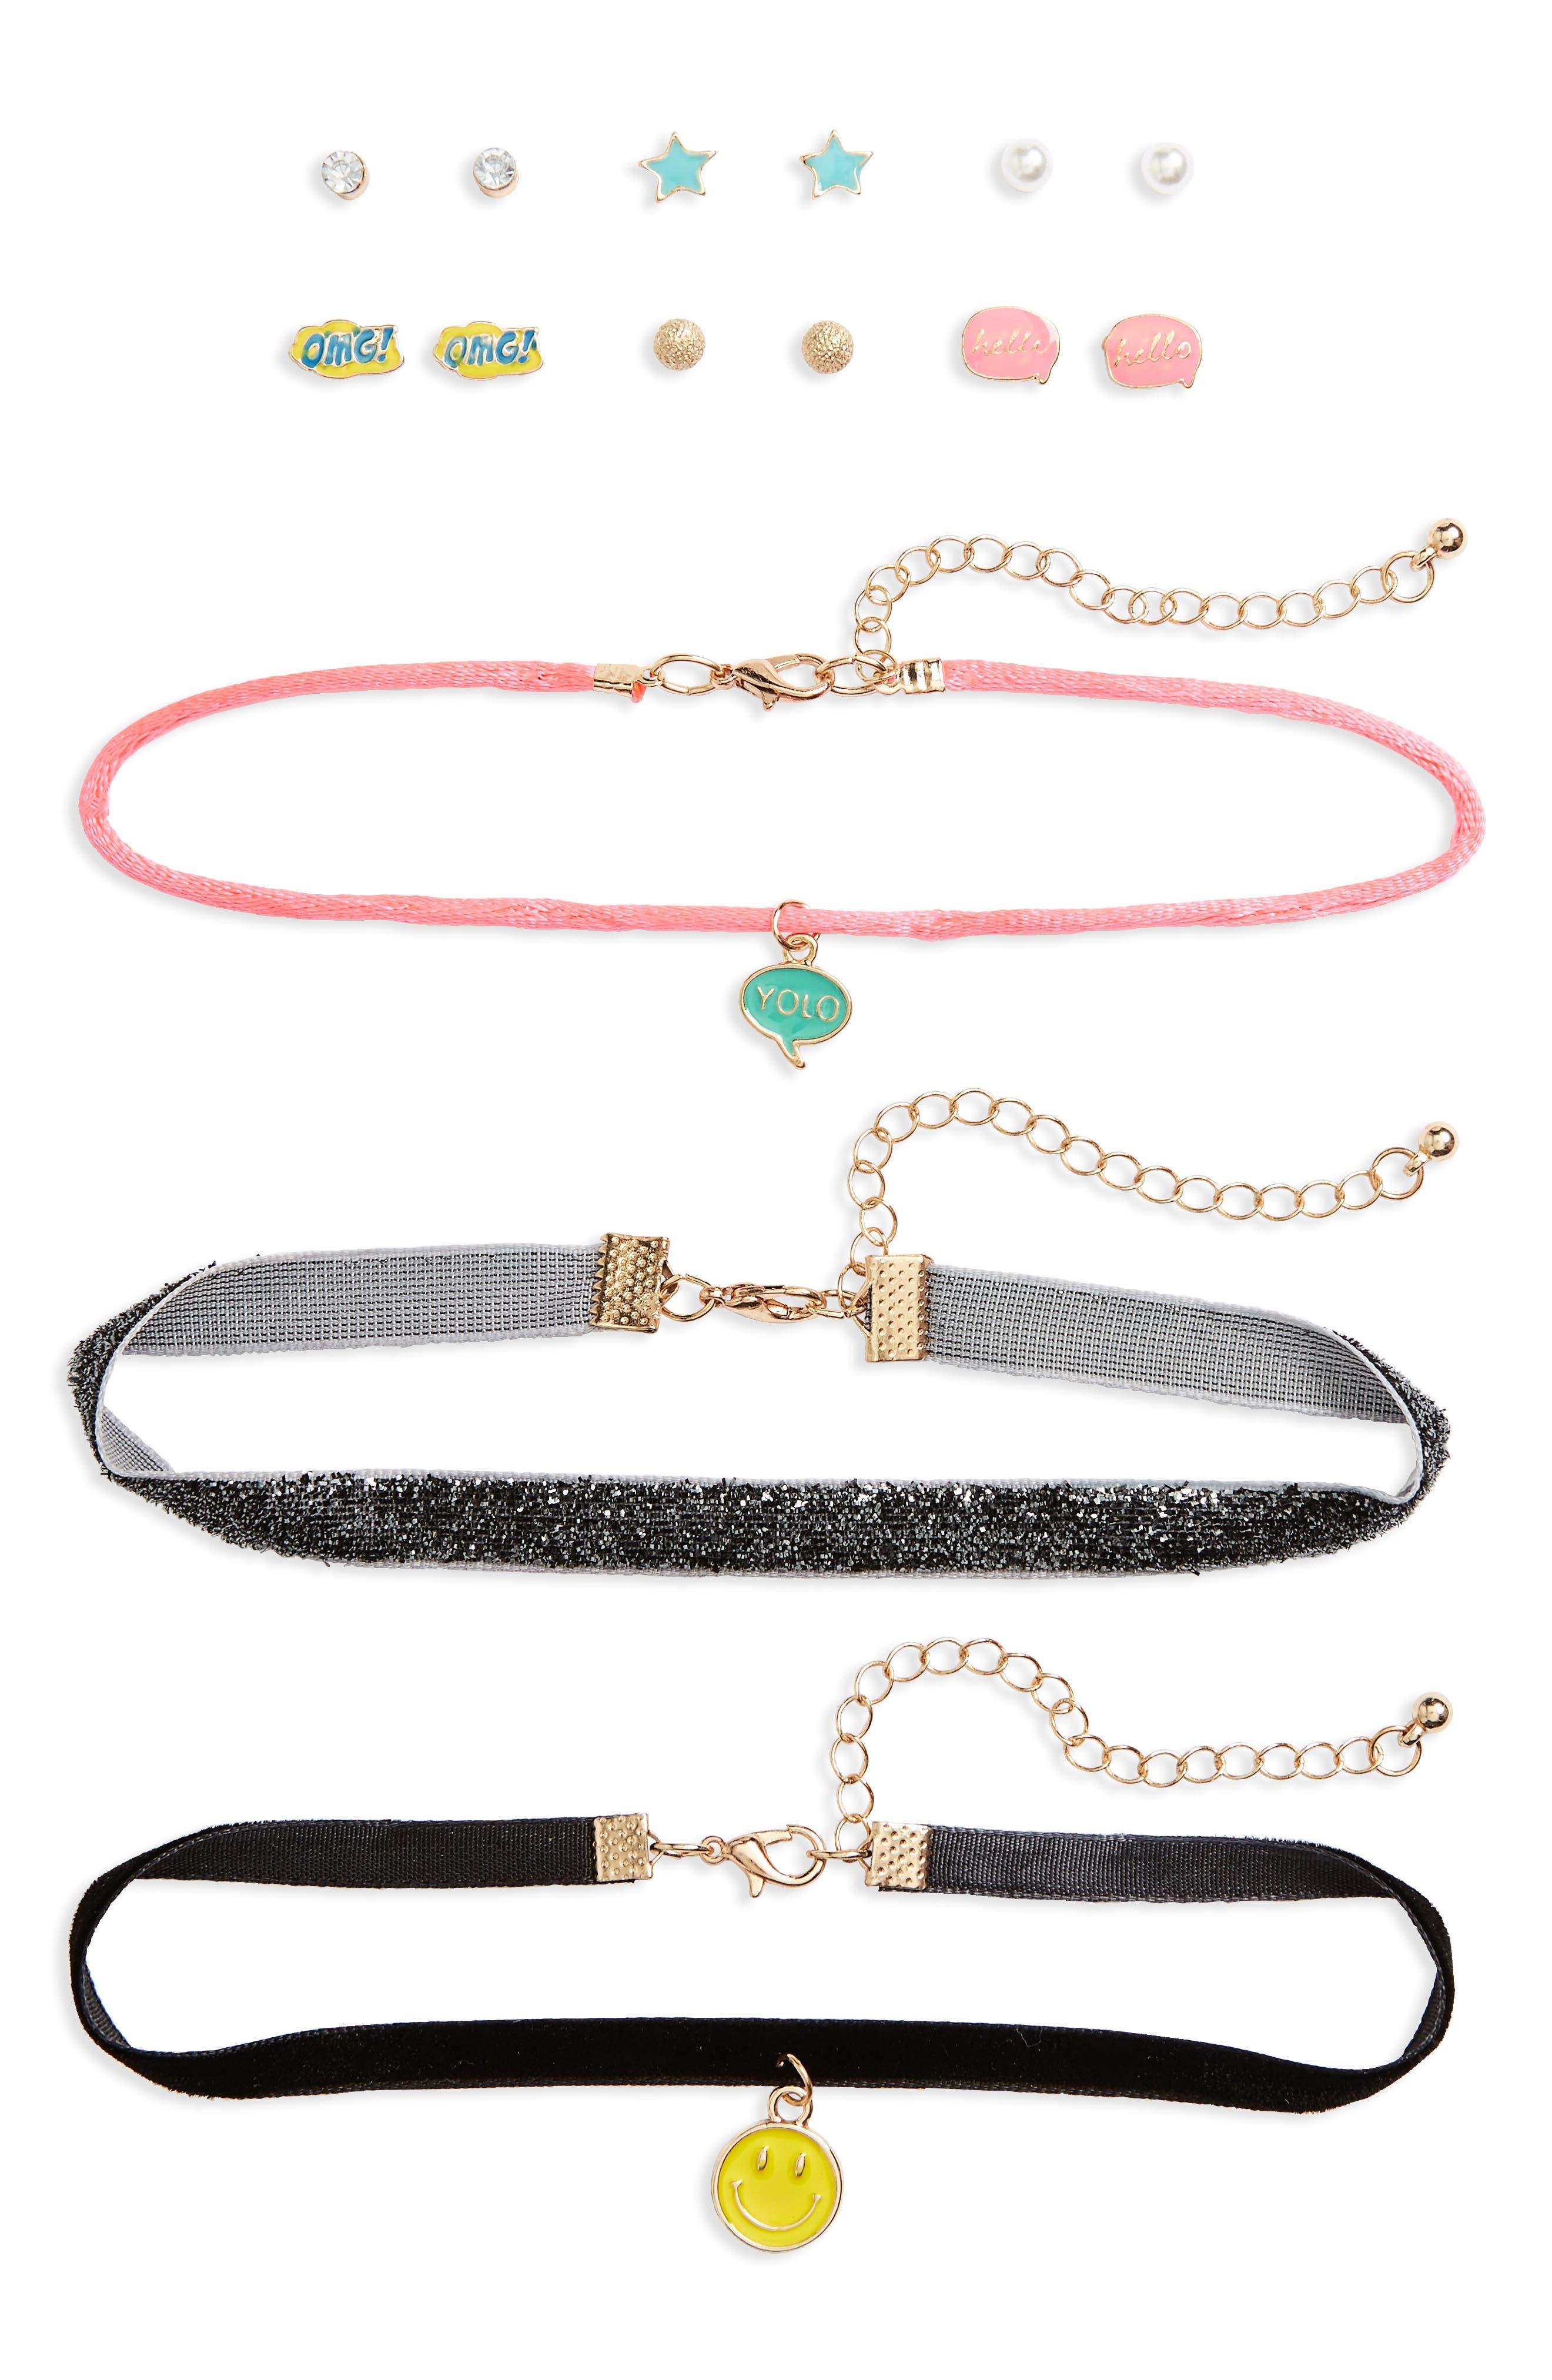 15-Piece Earring & Choker Set,                         Main,                         color, Black Multi